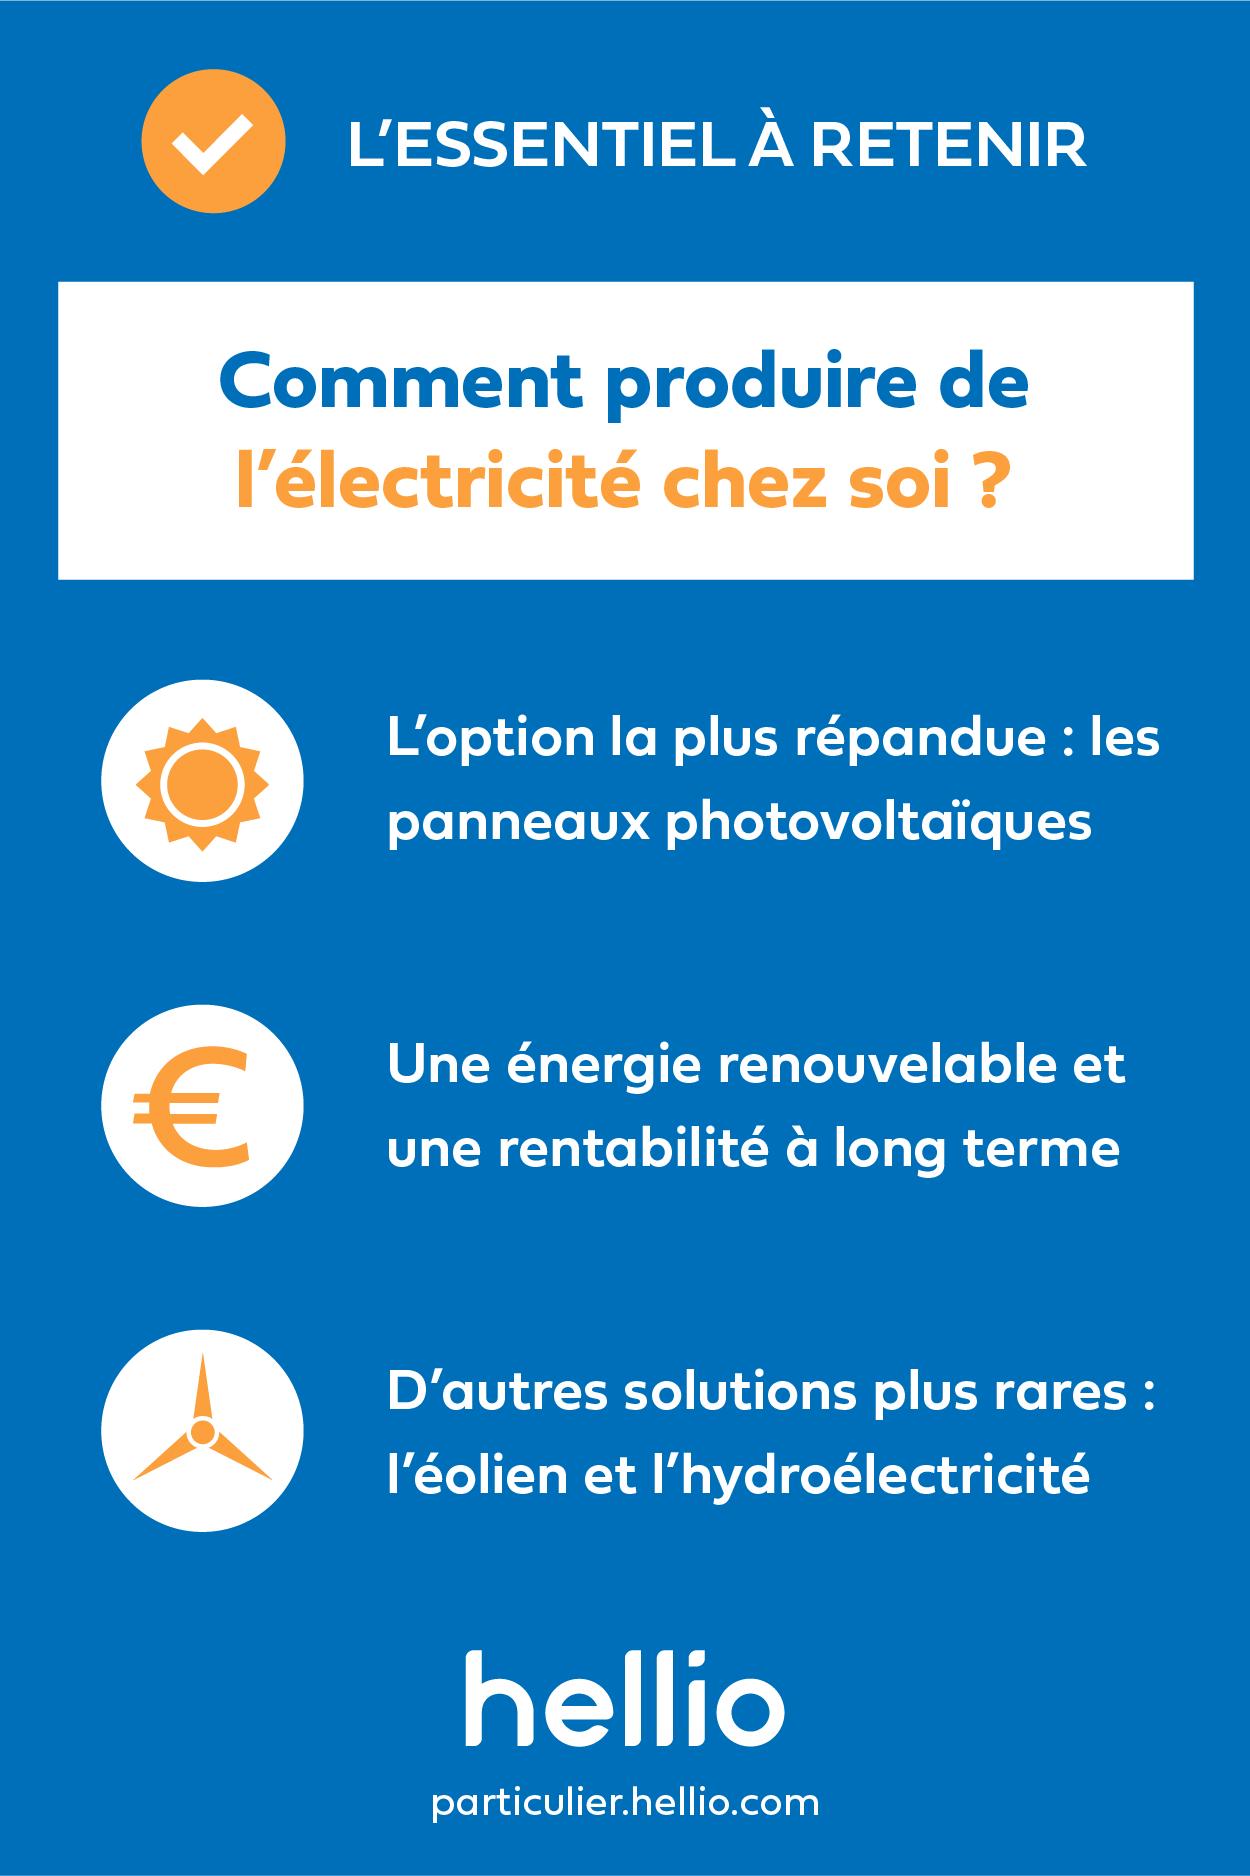 infographie-essentiel-retenir-hellio-produire-electricite-chez-soi